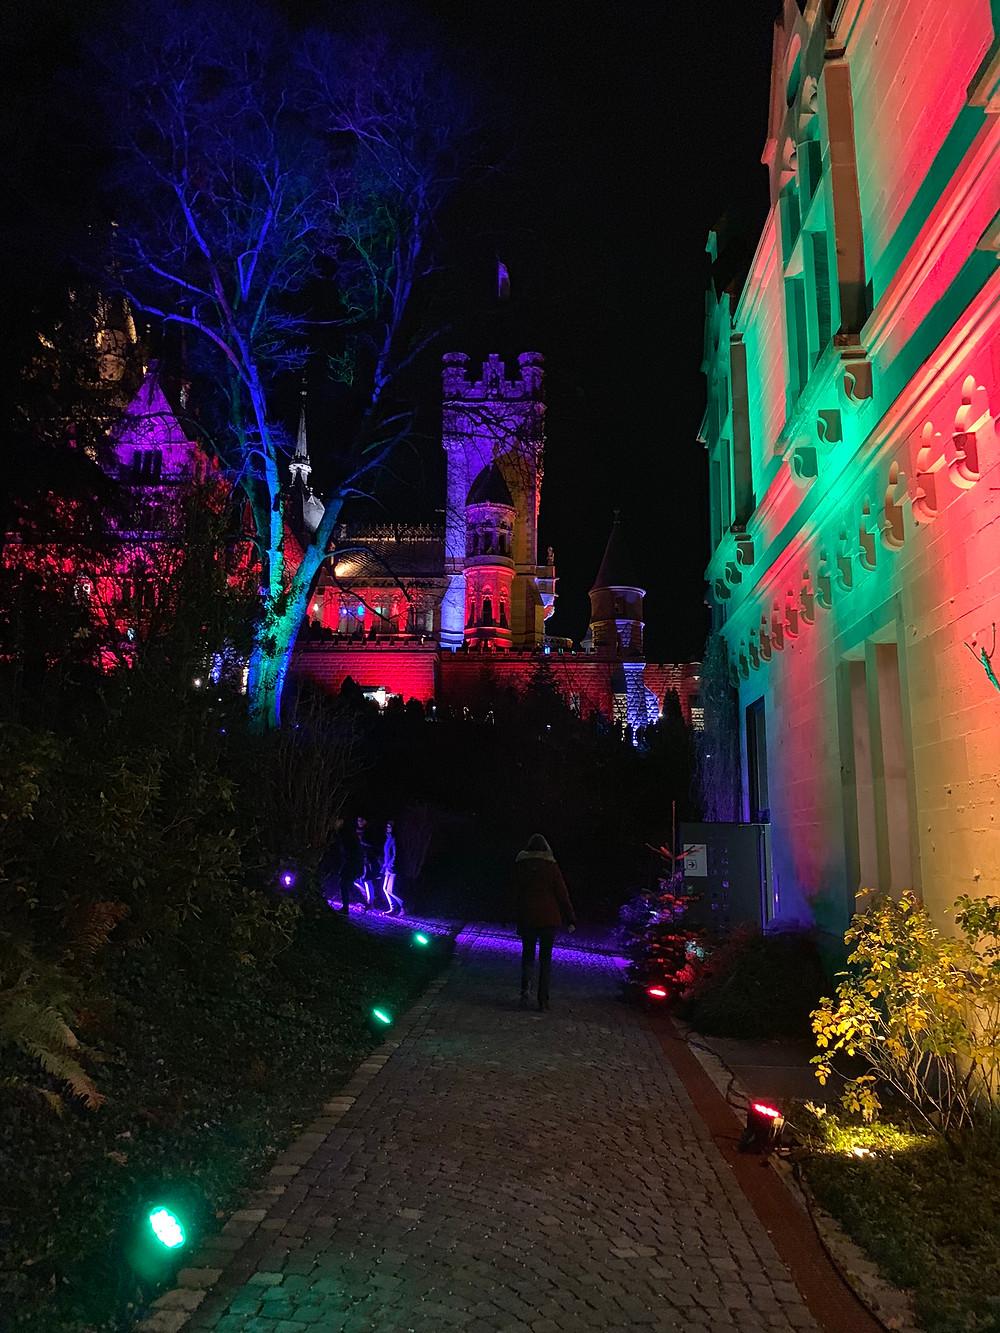 Drachenburg Castle in Germany